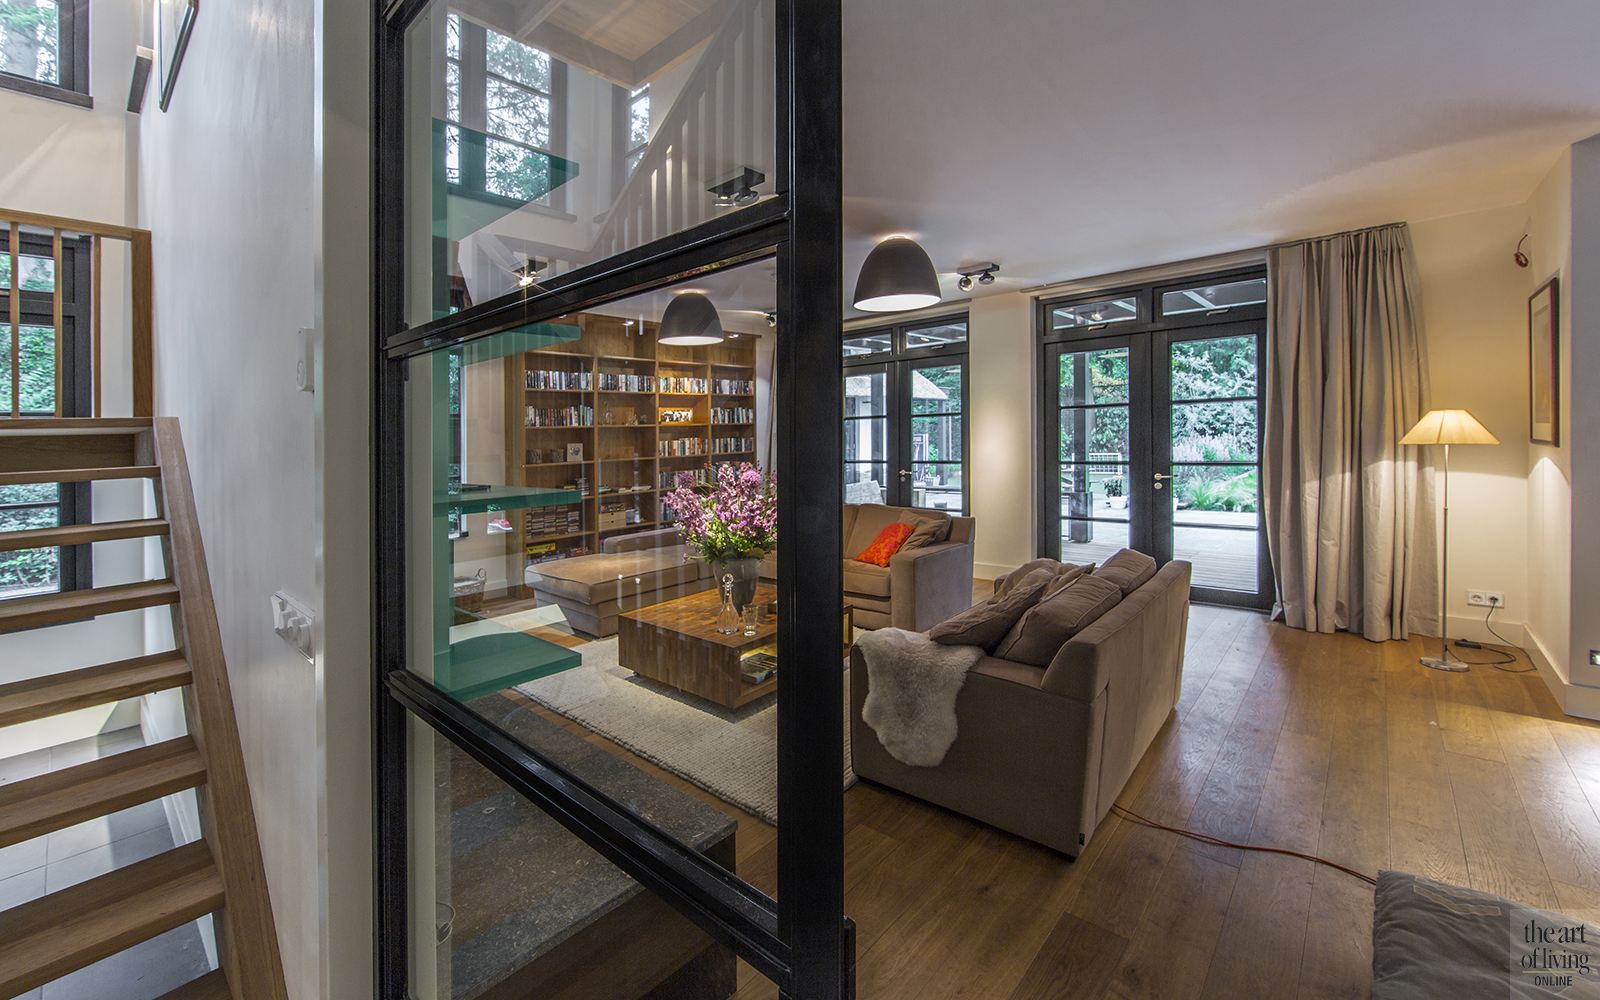 Villa, Denoldervleugels, Theartofliving, landelijke villa, hout, interieur